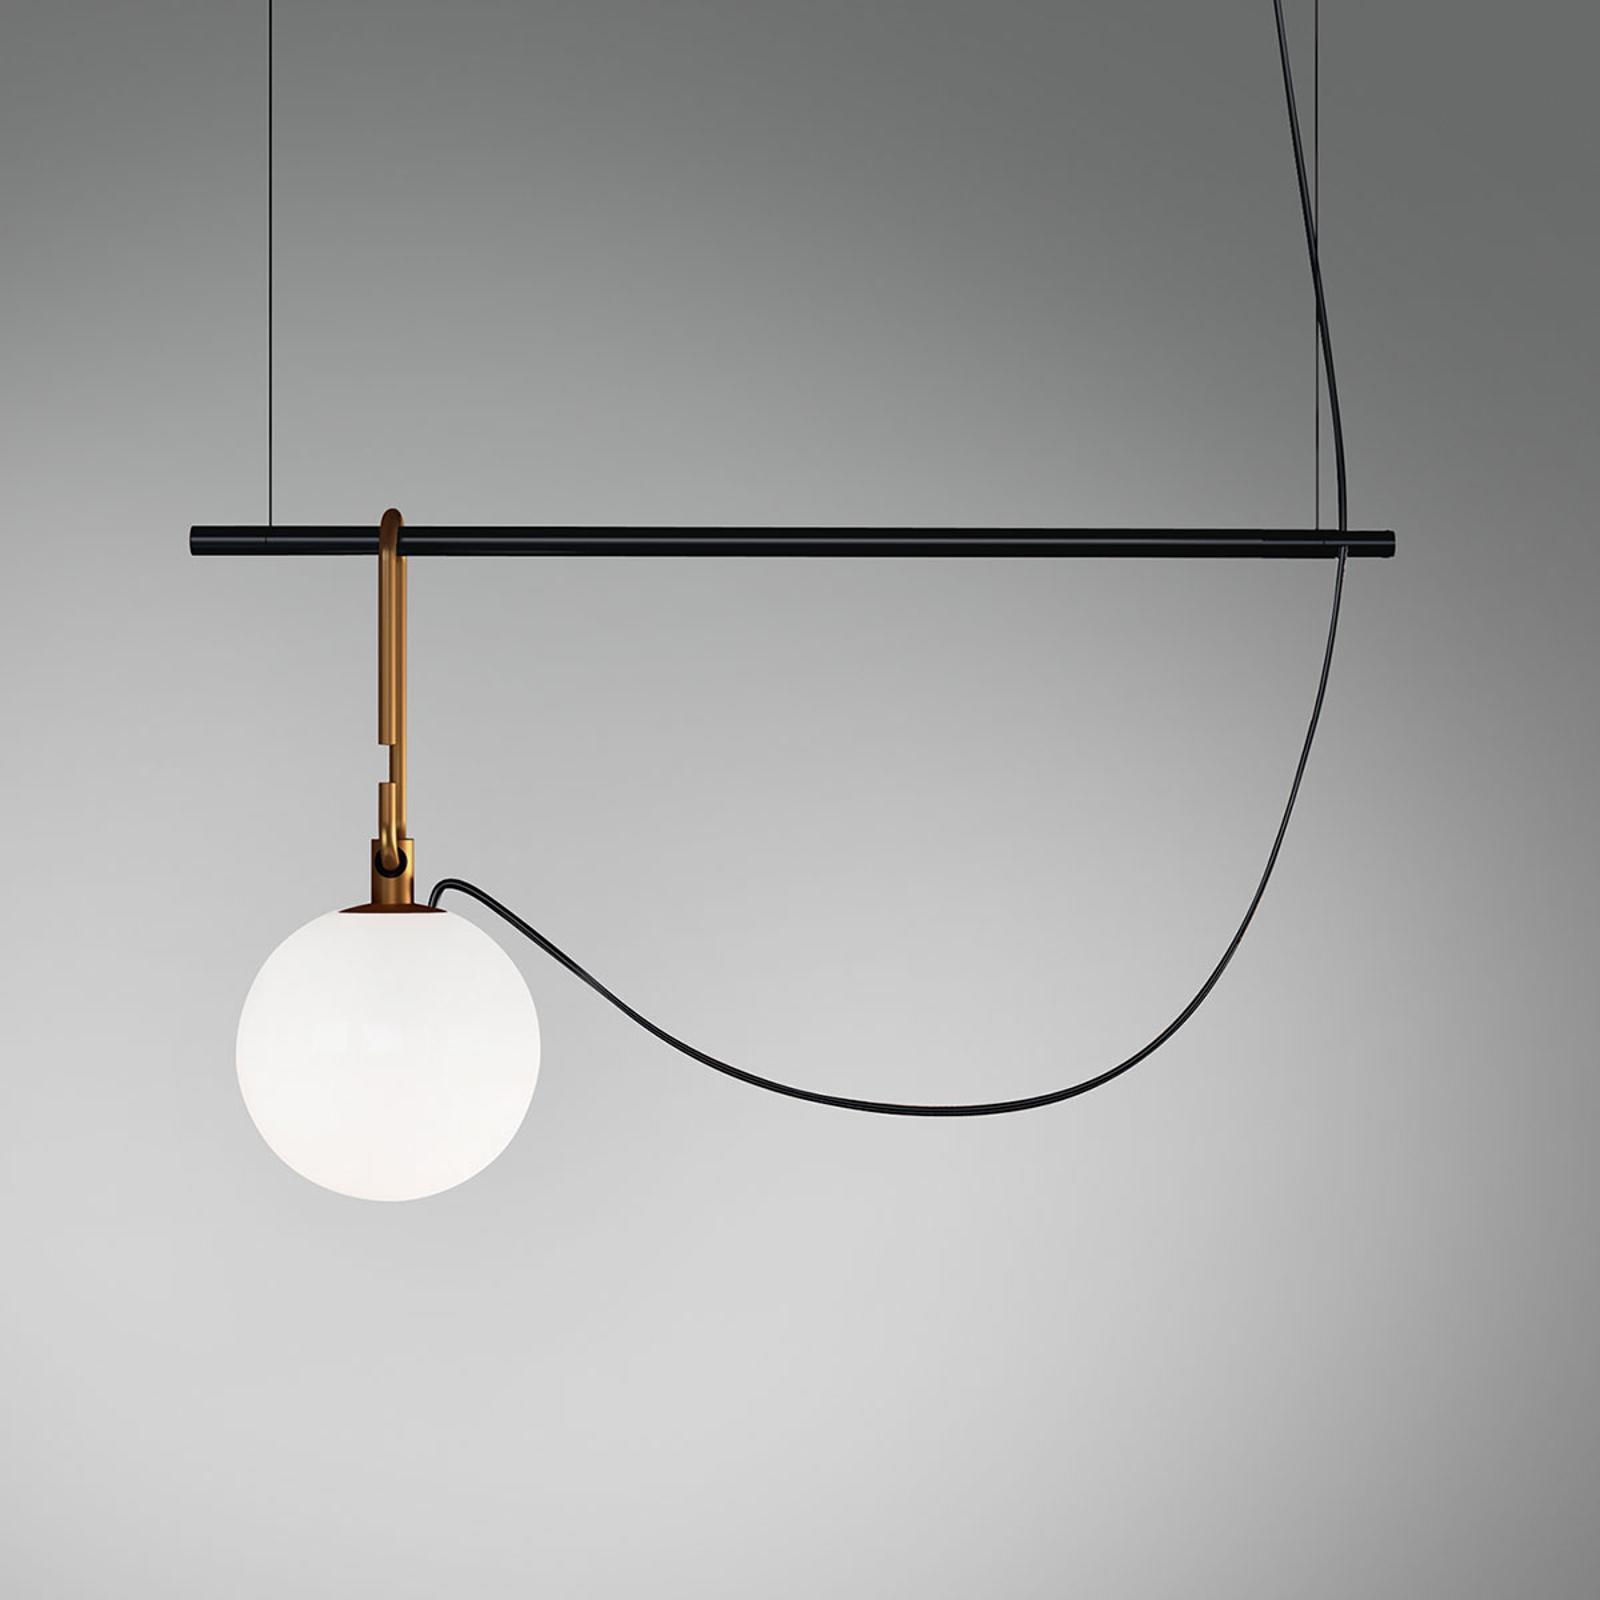 Artemide nh S1 14 lampa wisząca 55 cm kula Ø14cm